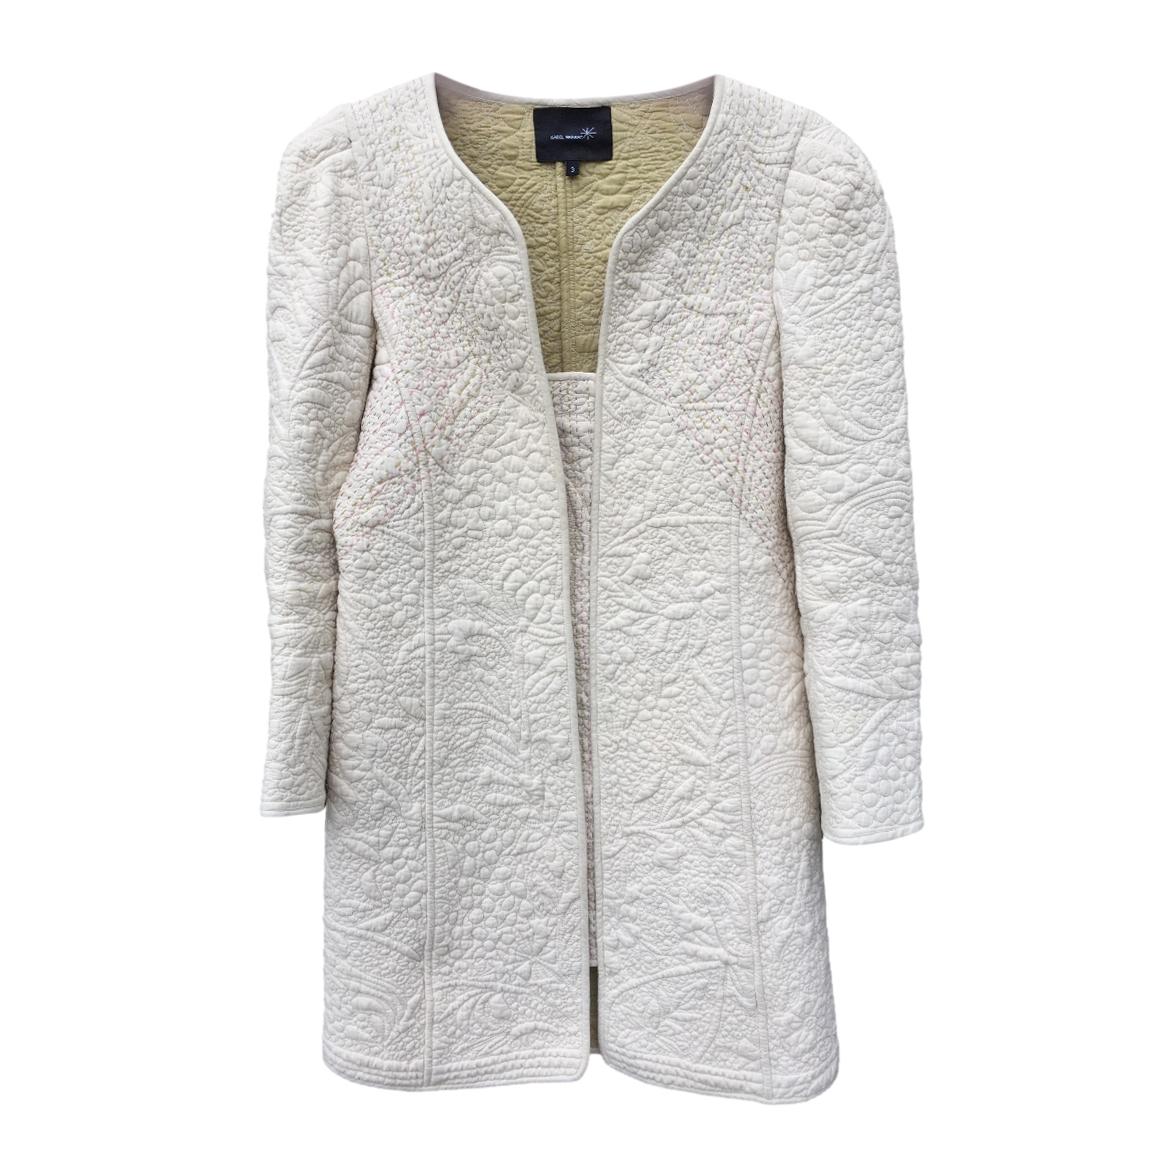 Isabel Marant Embroidered Textured Ecru Coat